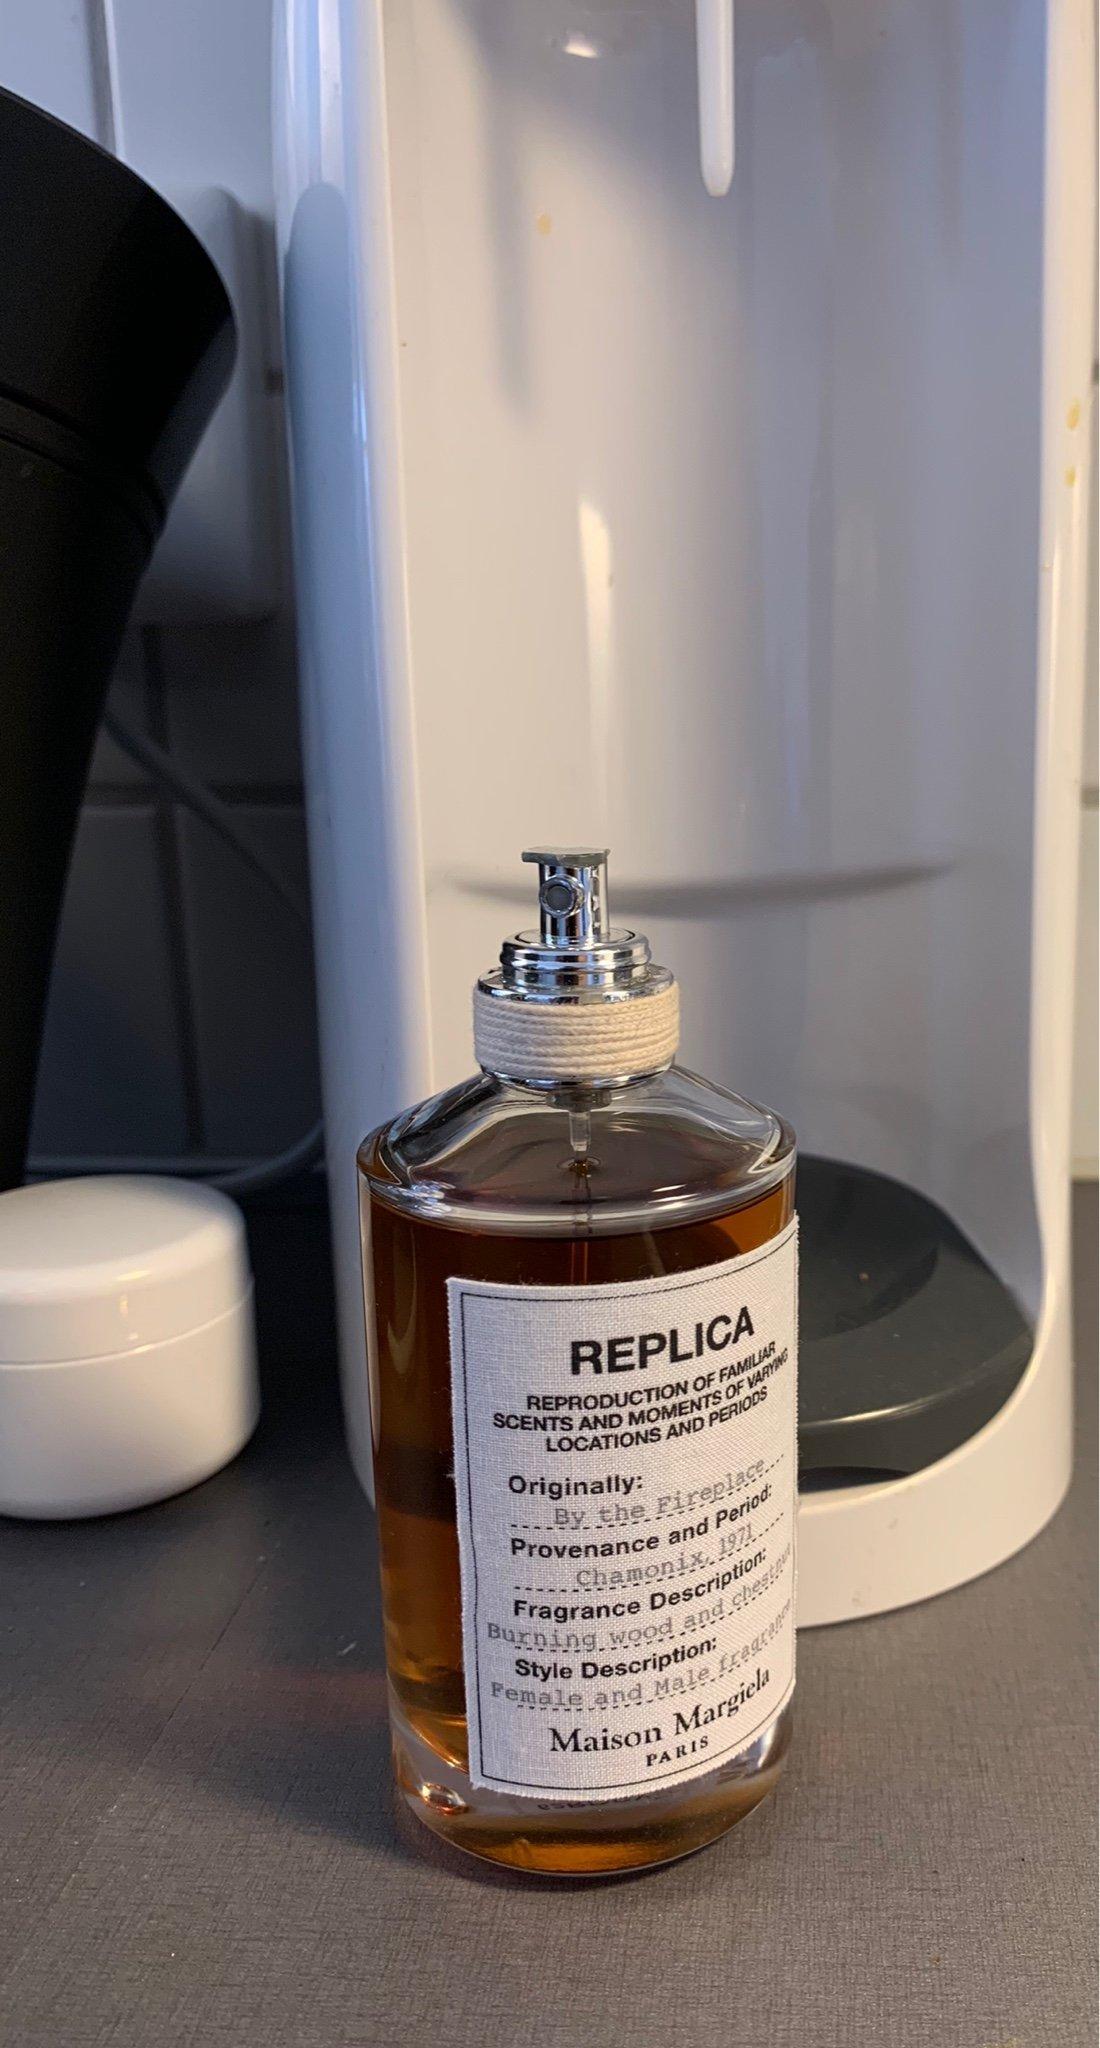 Replica By The Fireplace EdT, 100 ml Parfym & EdT Köp